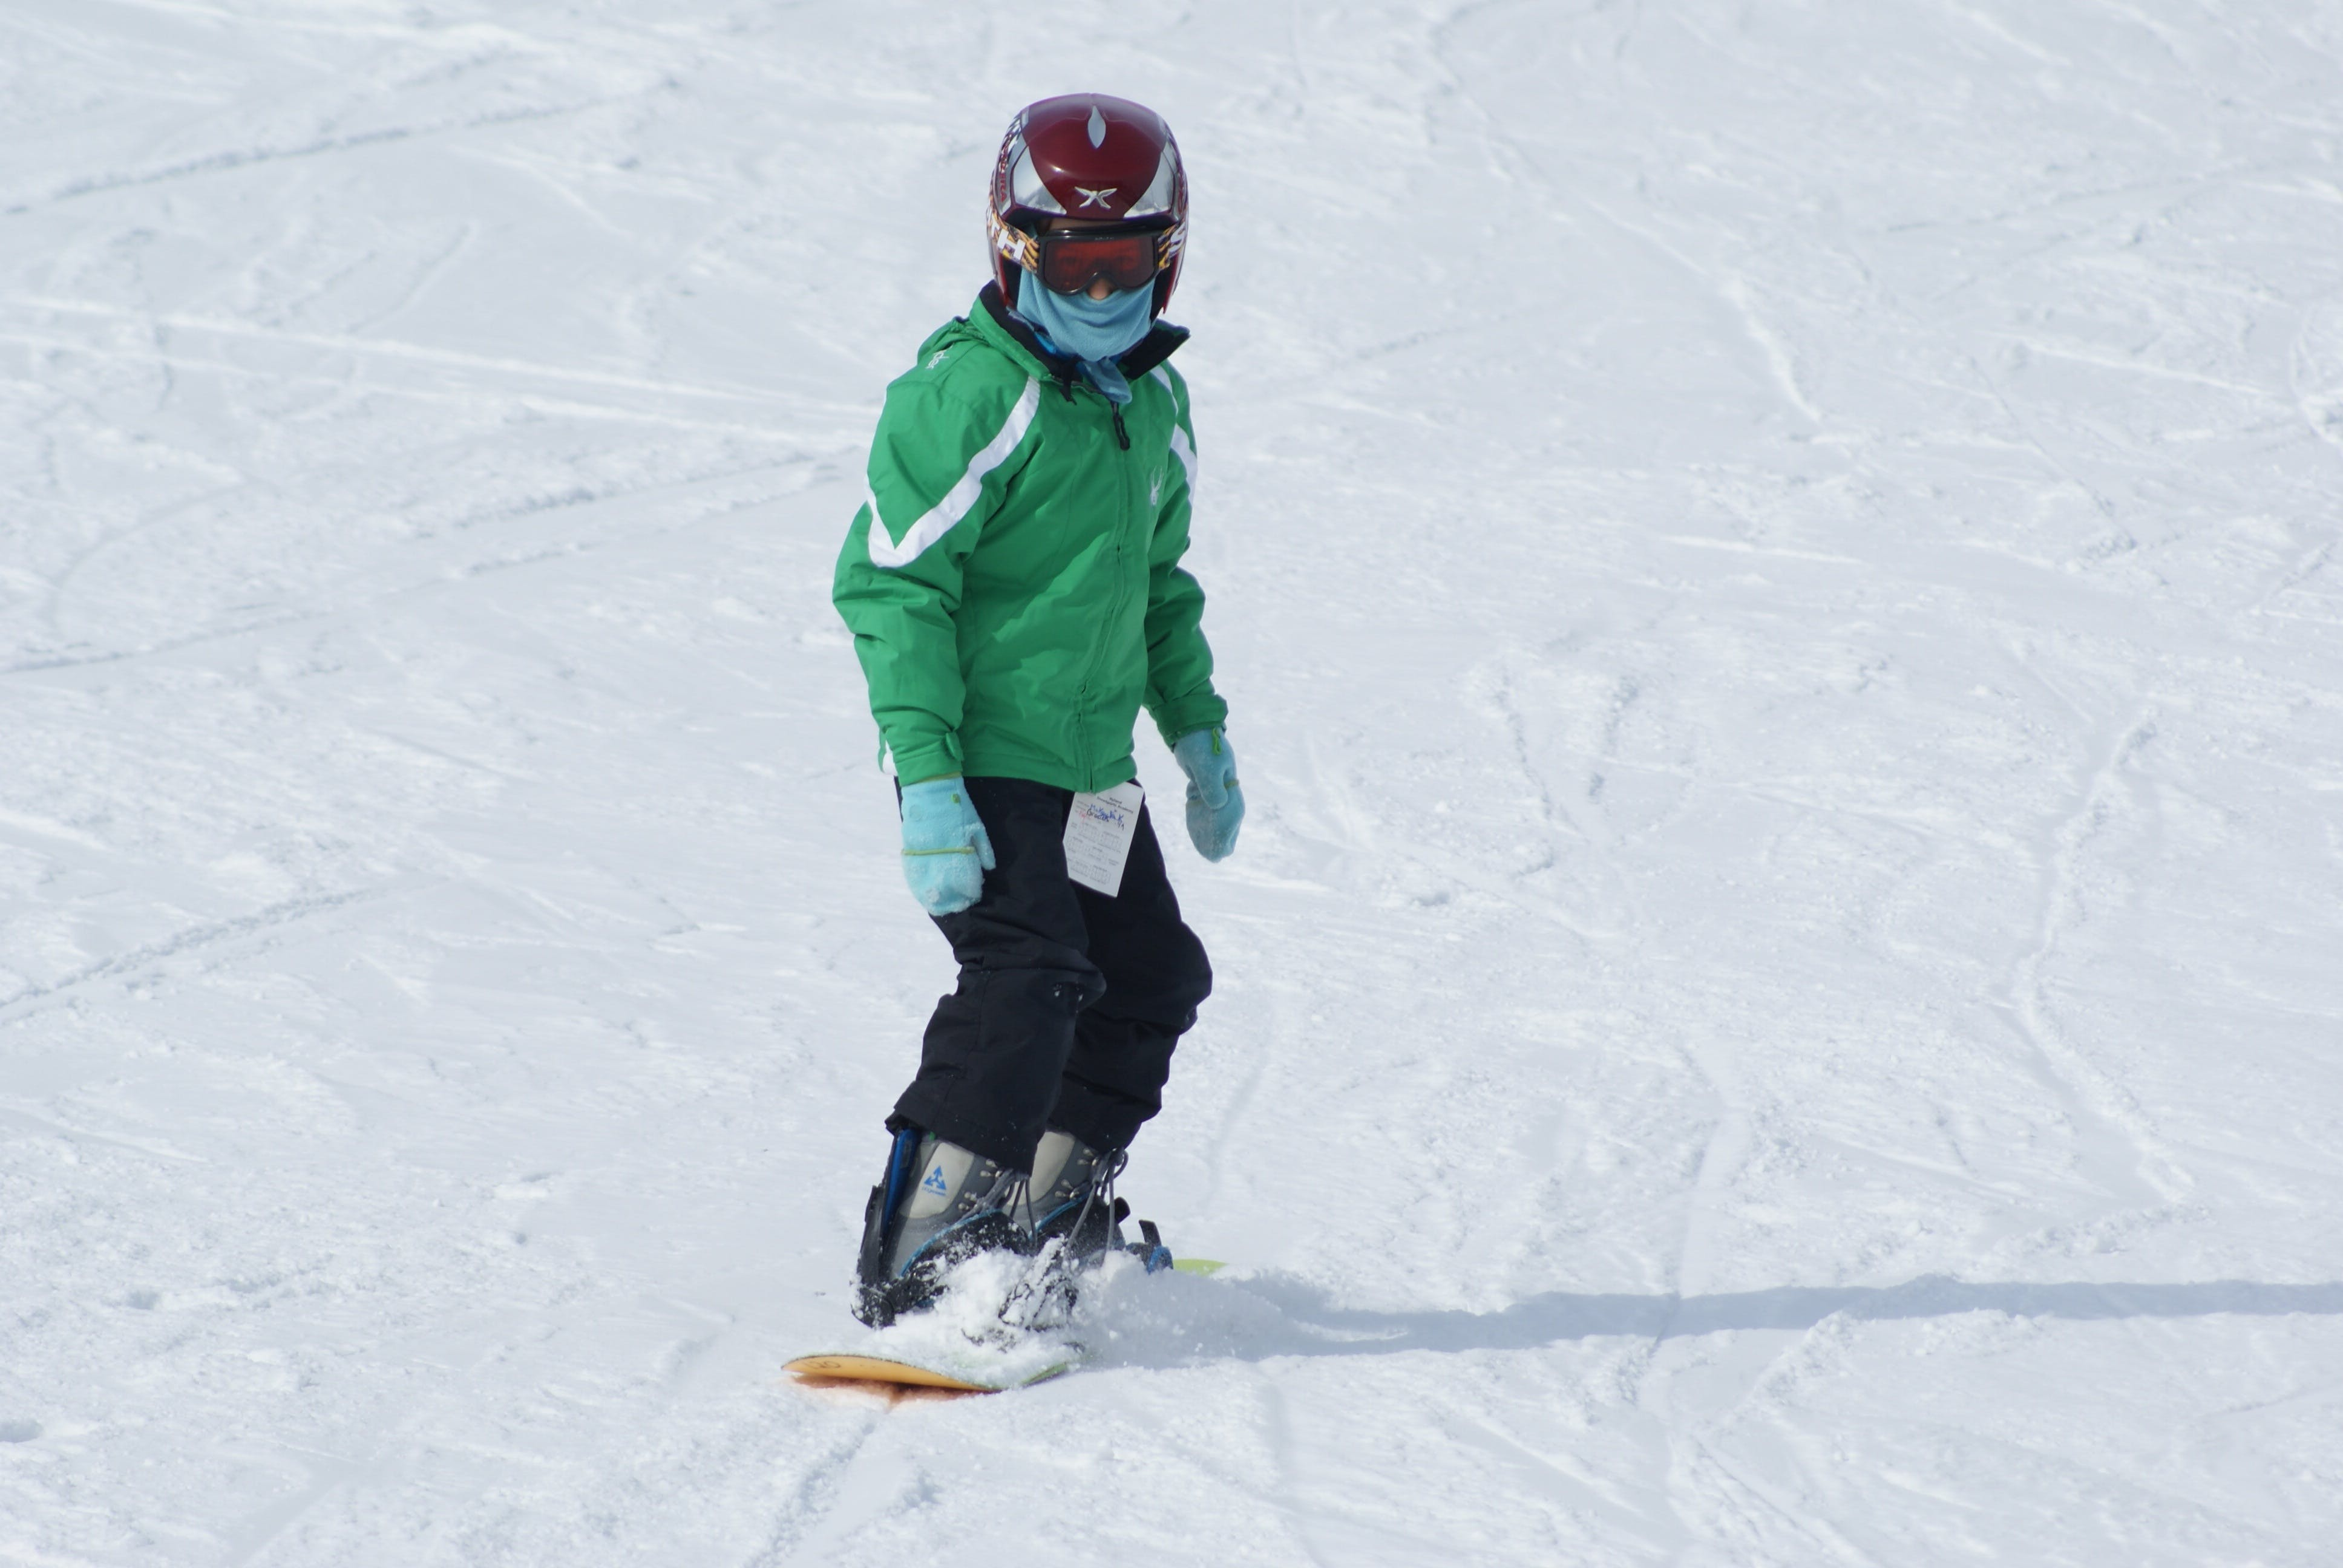 Free stock photo of snow, winter, sport, white